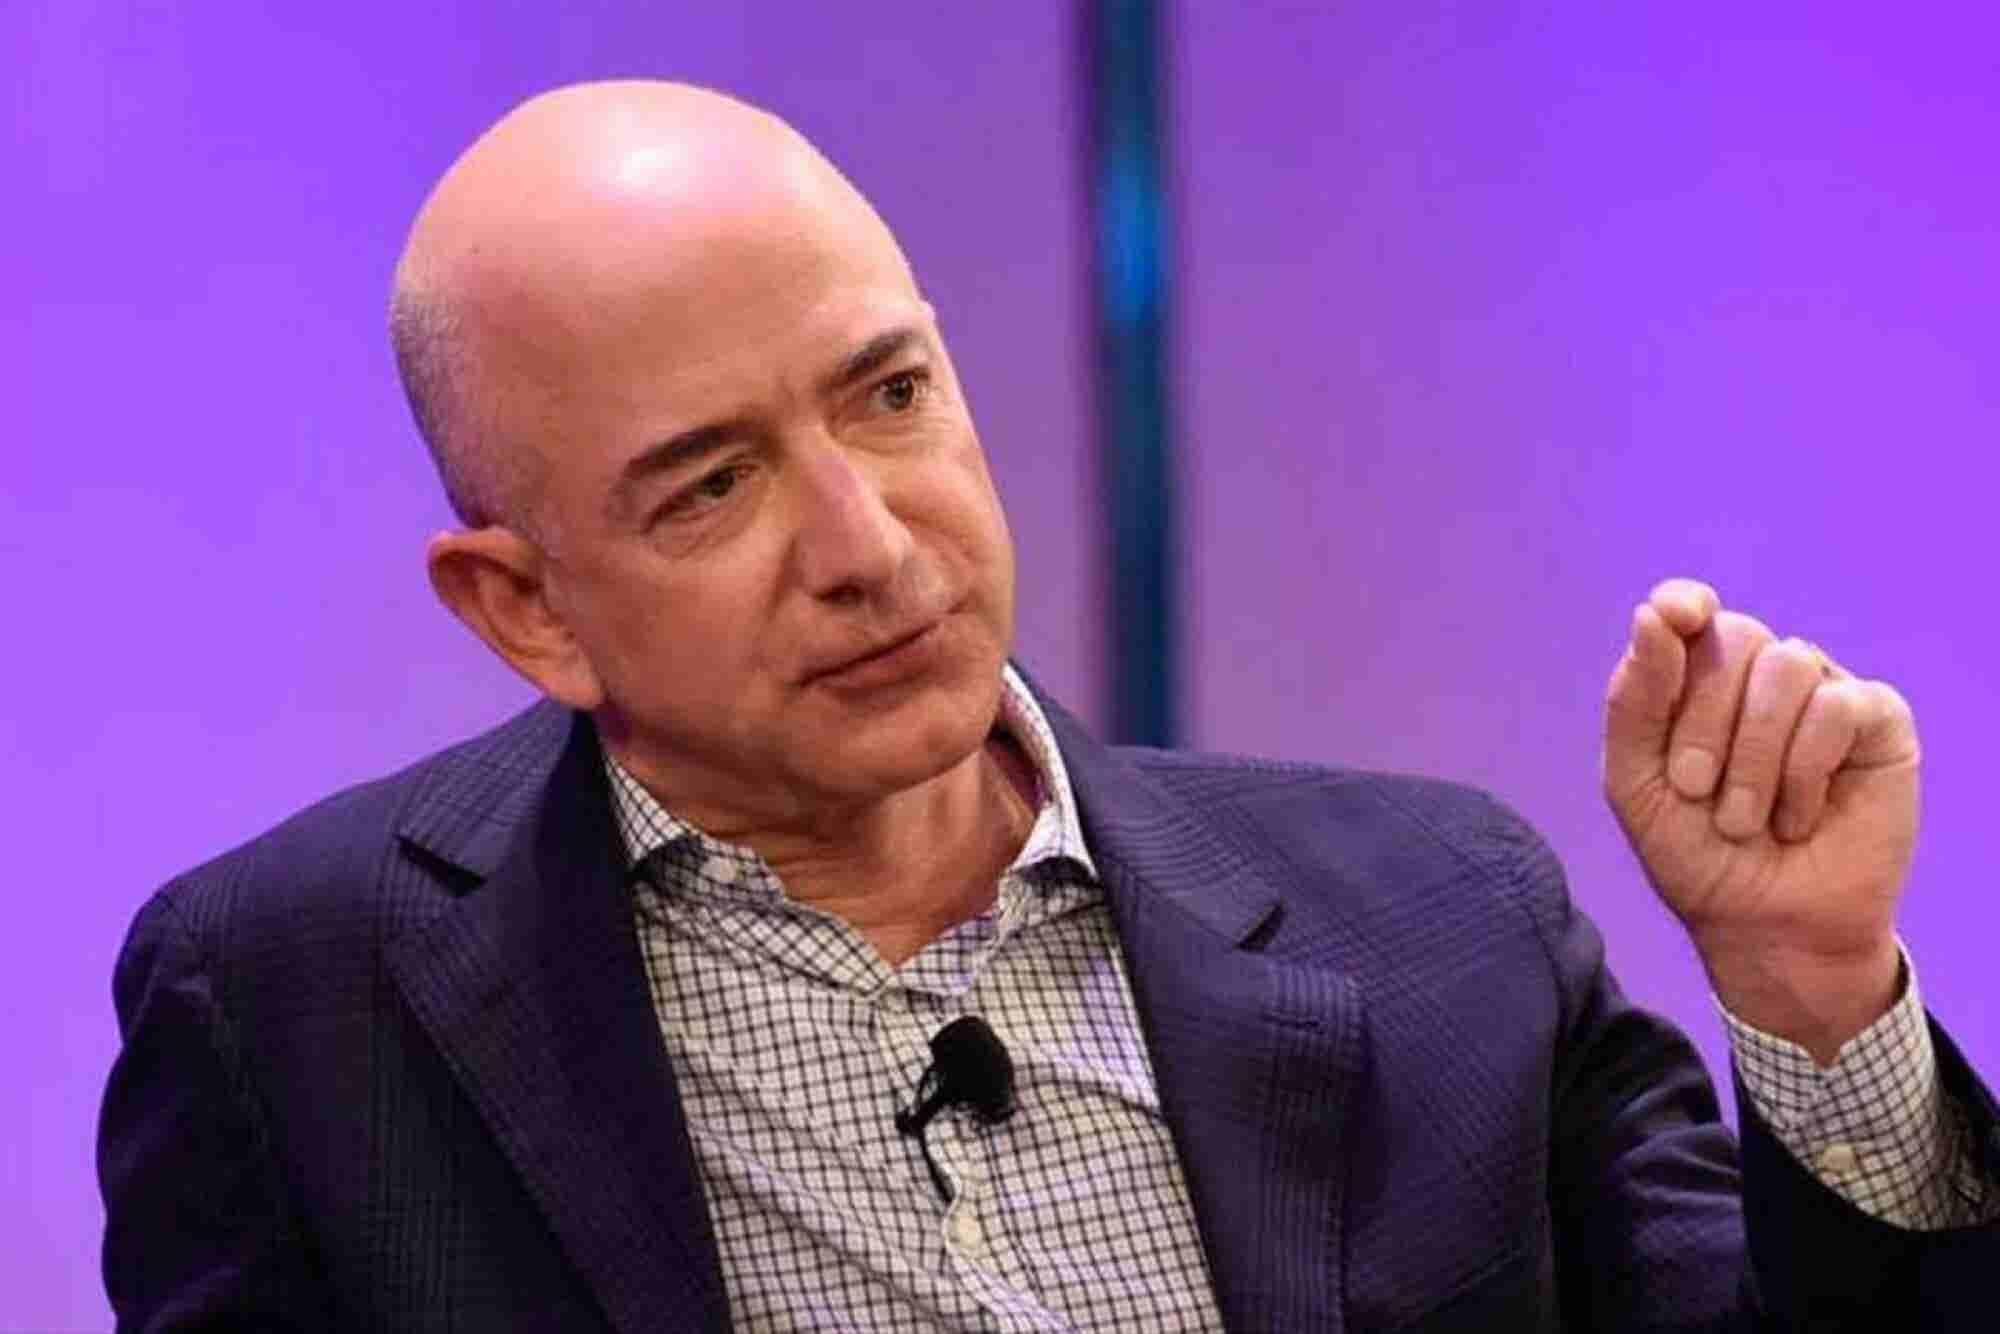 Amazon's Jeff Bezos: 'I've Made Billions of Dollars of Failures'